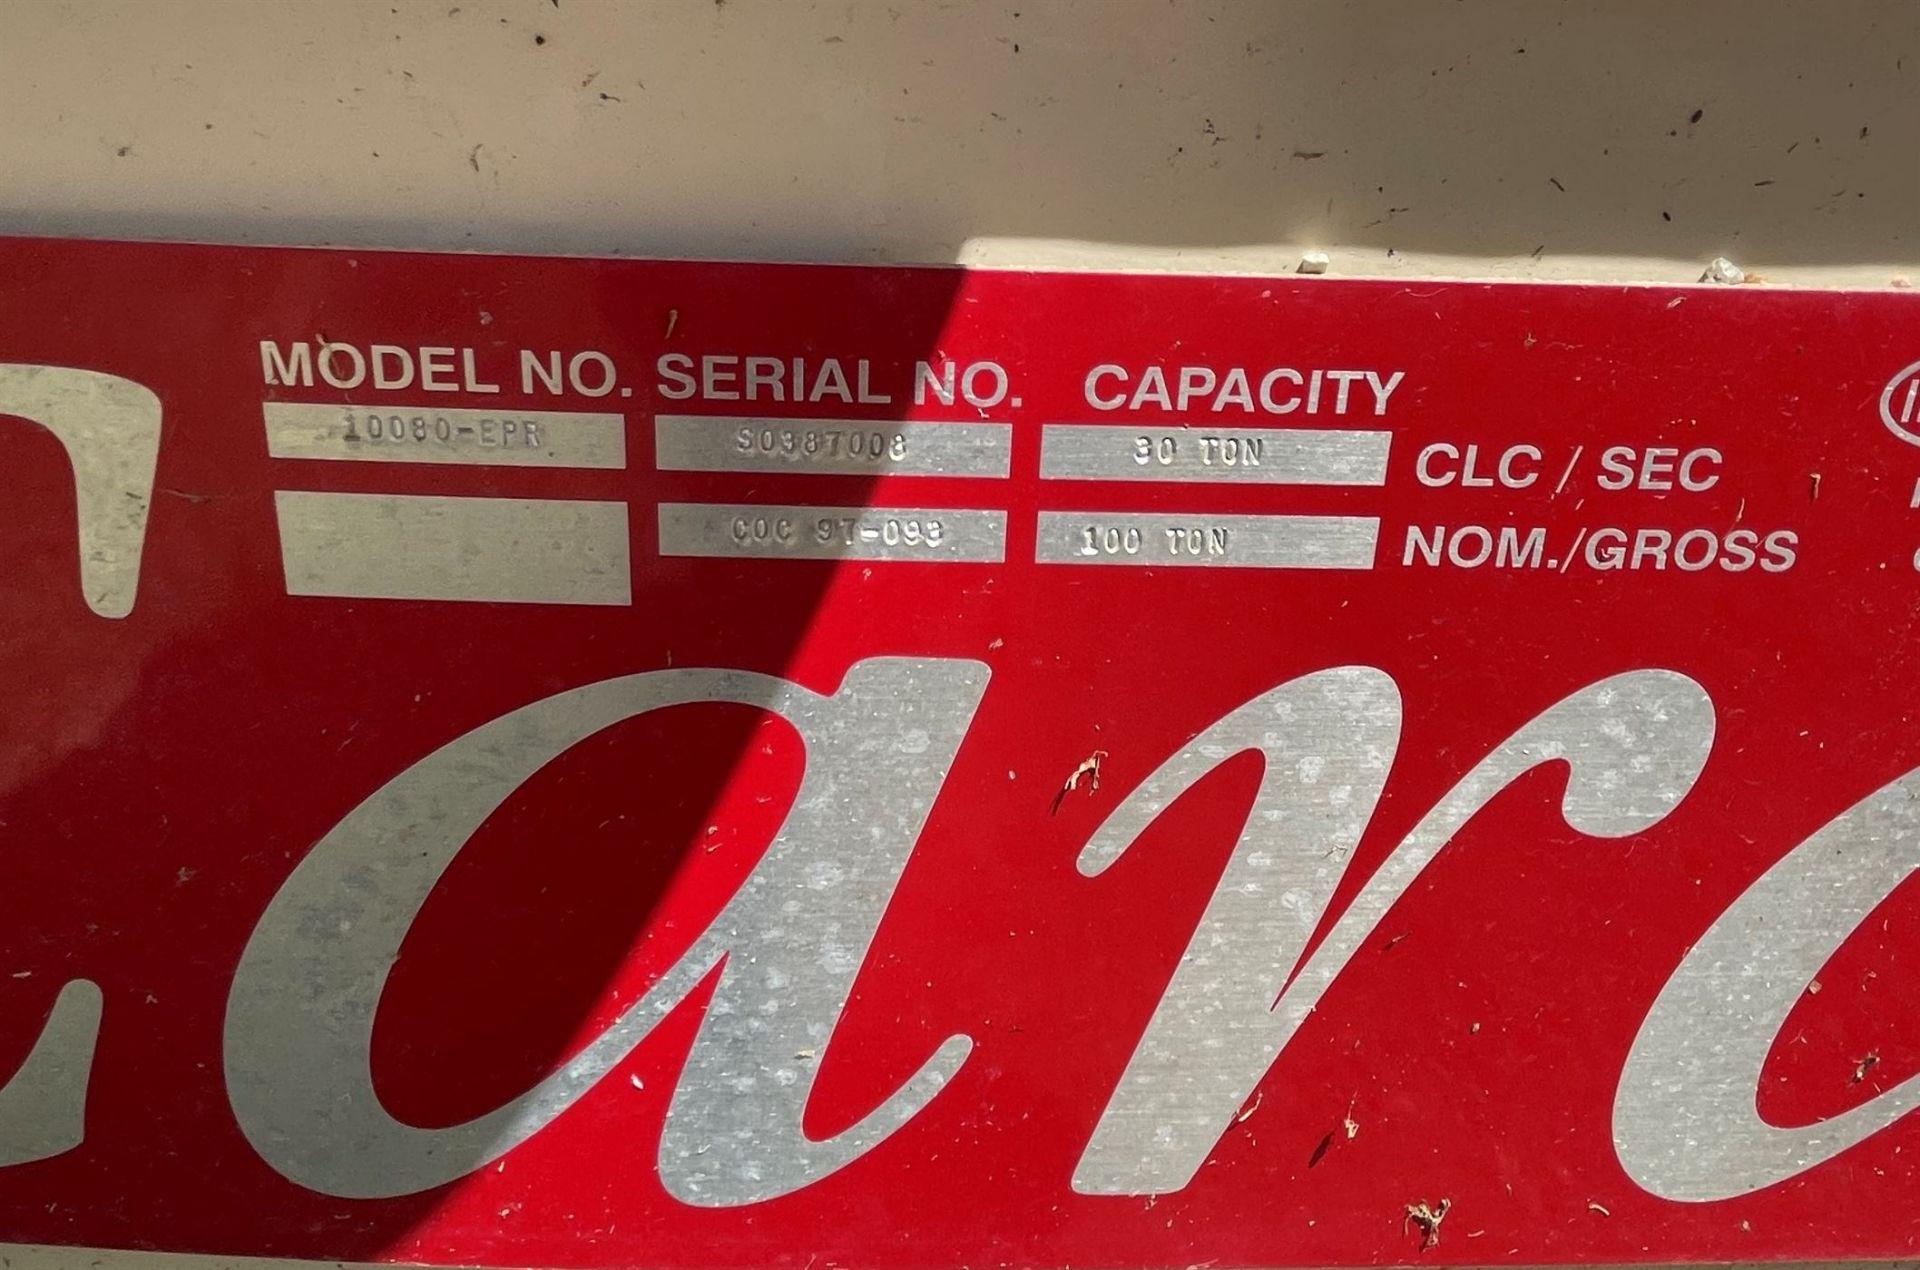 CARDINAL 10080-EPR 80' X 160,000 LBS Truck Scale, s/n S0387008, 3-Section Steel Deck, (2) Digital - Image 5 of 7